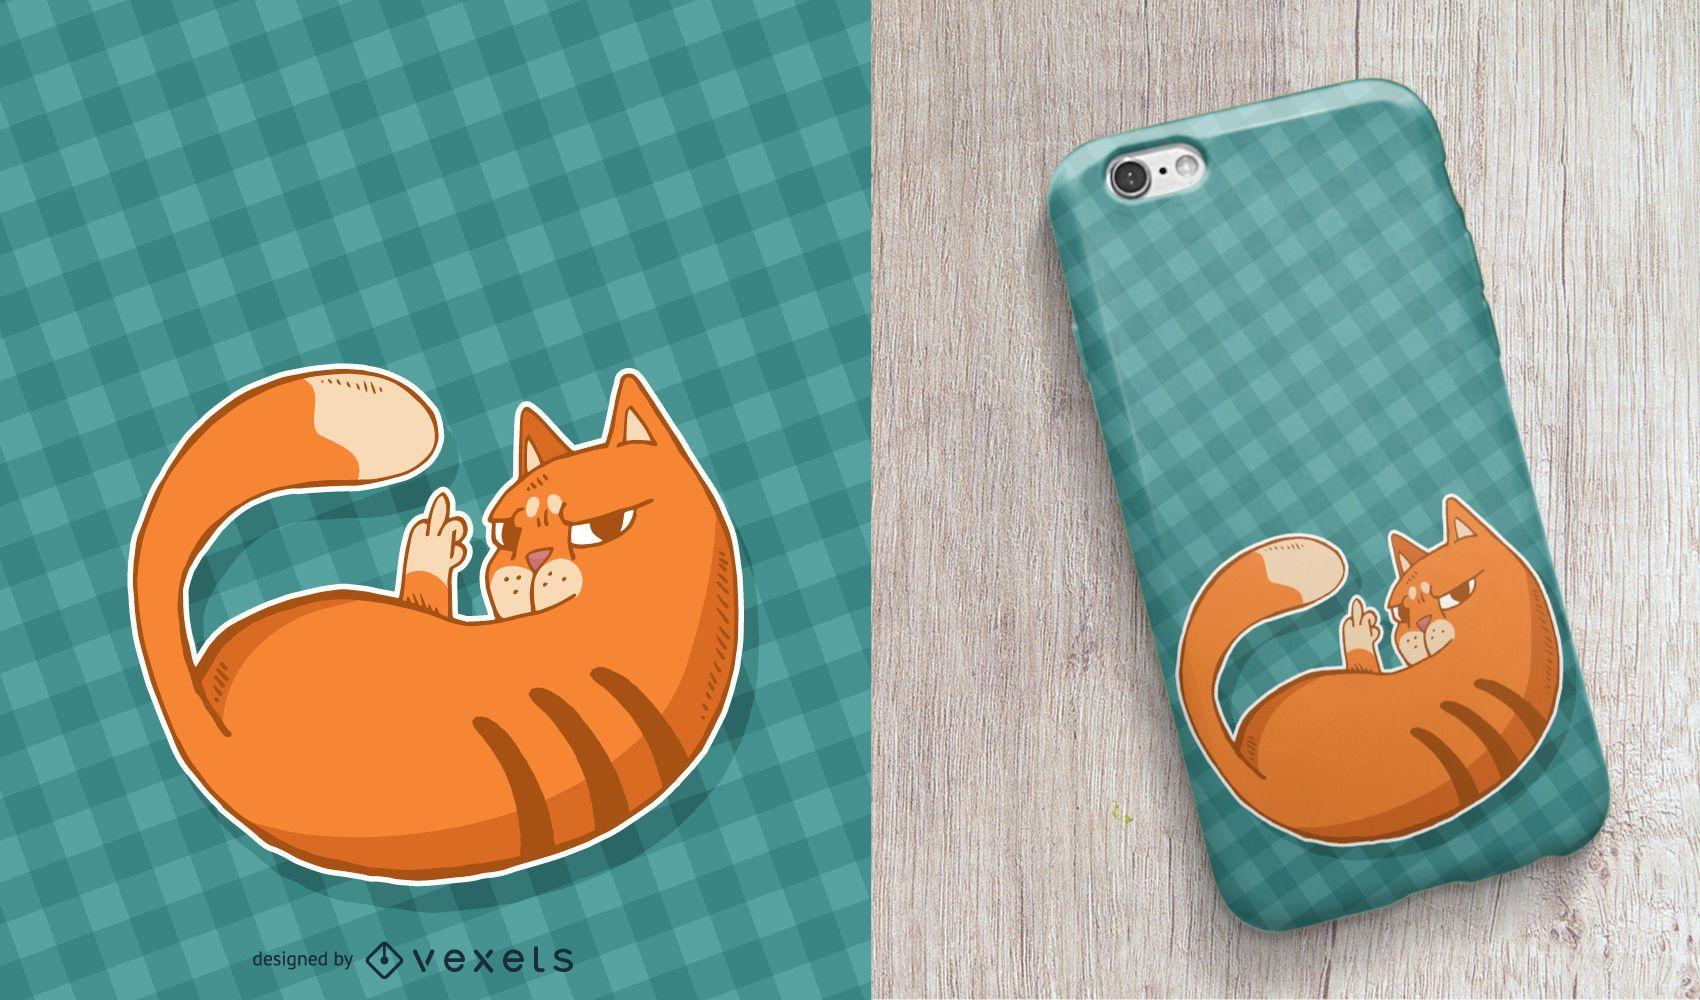 Orange Tabby phone case design